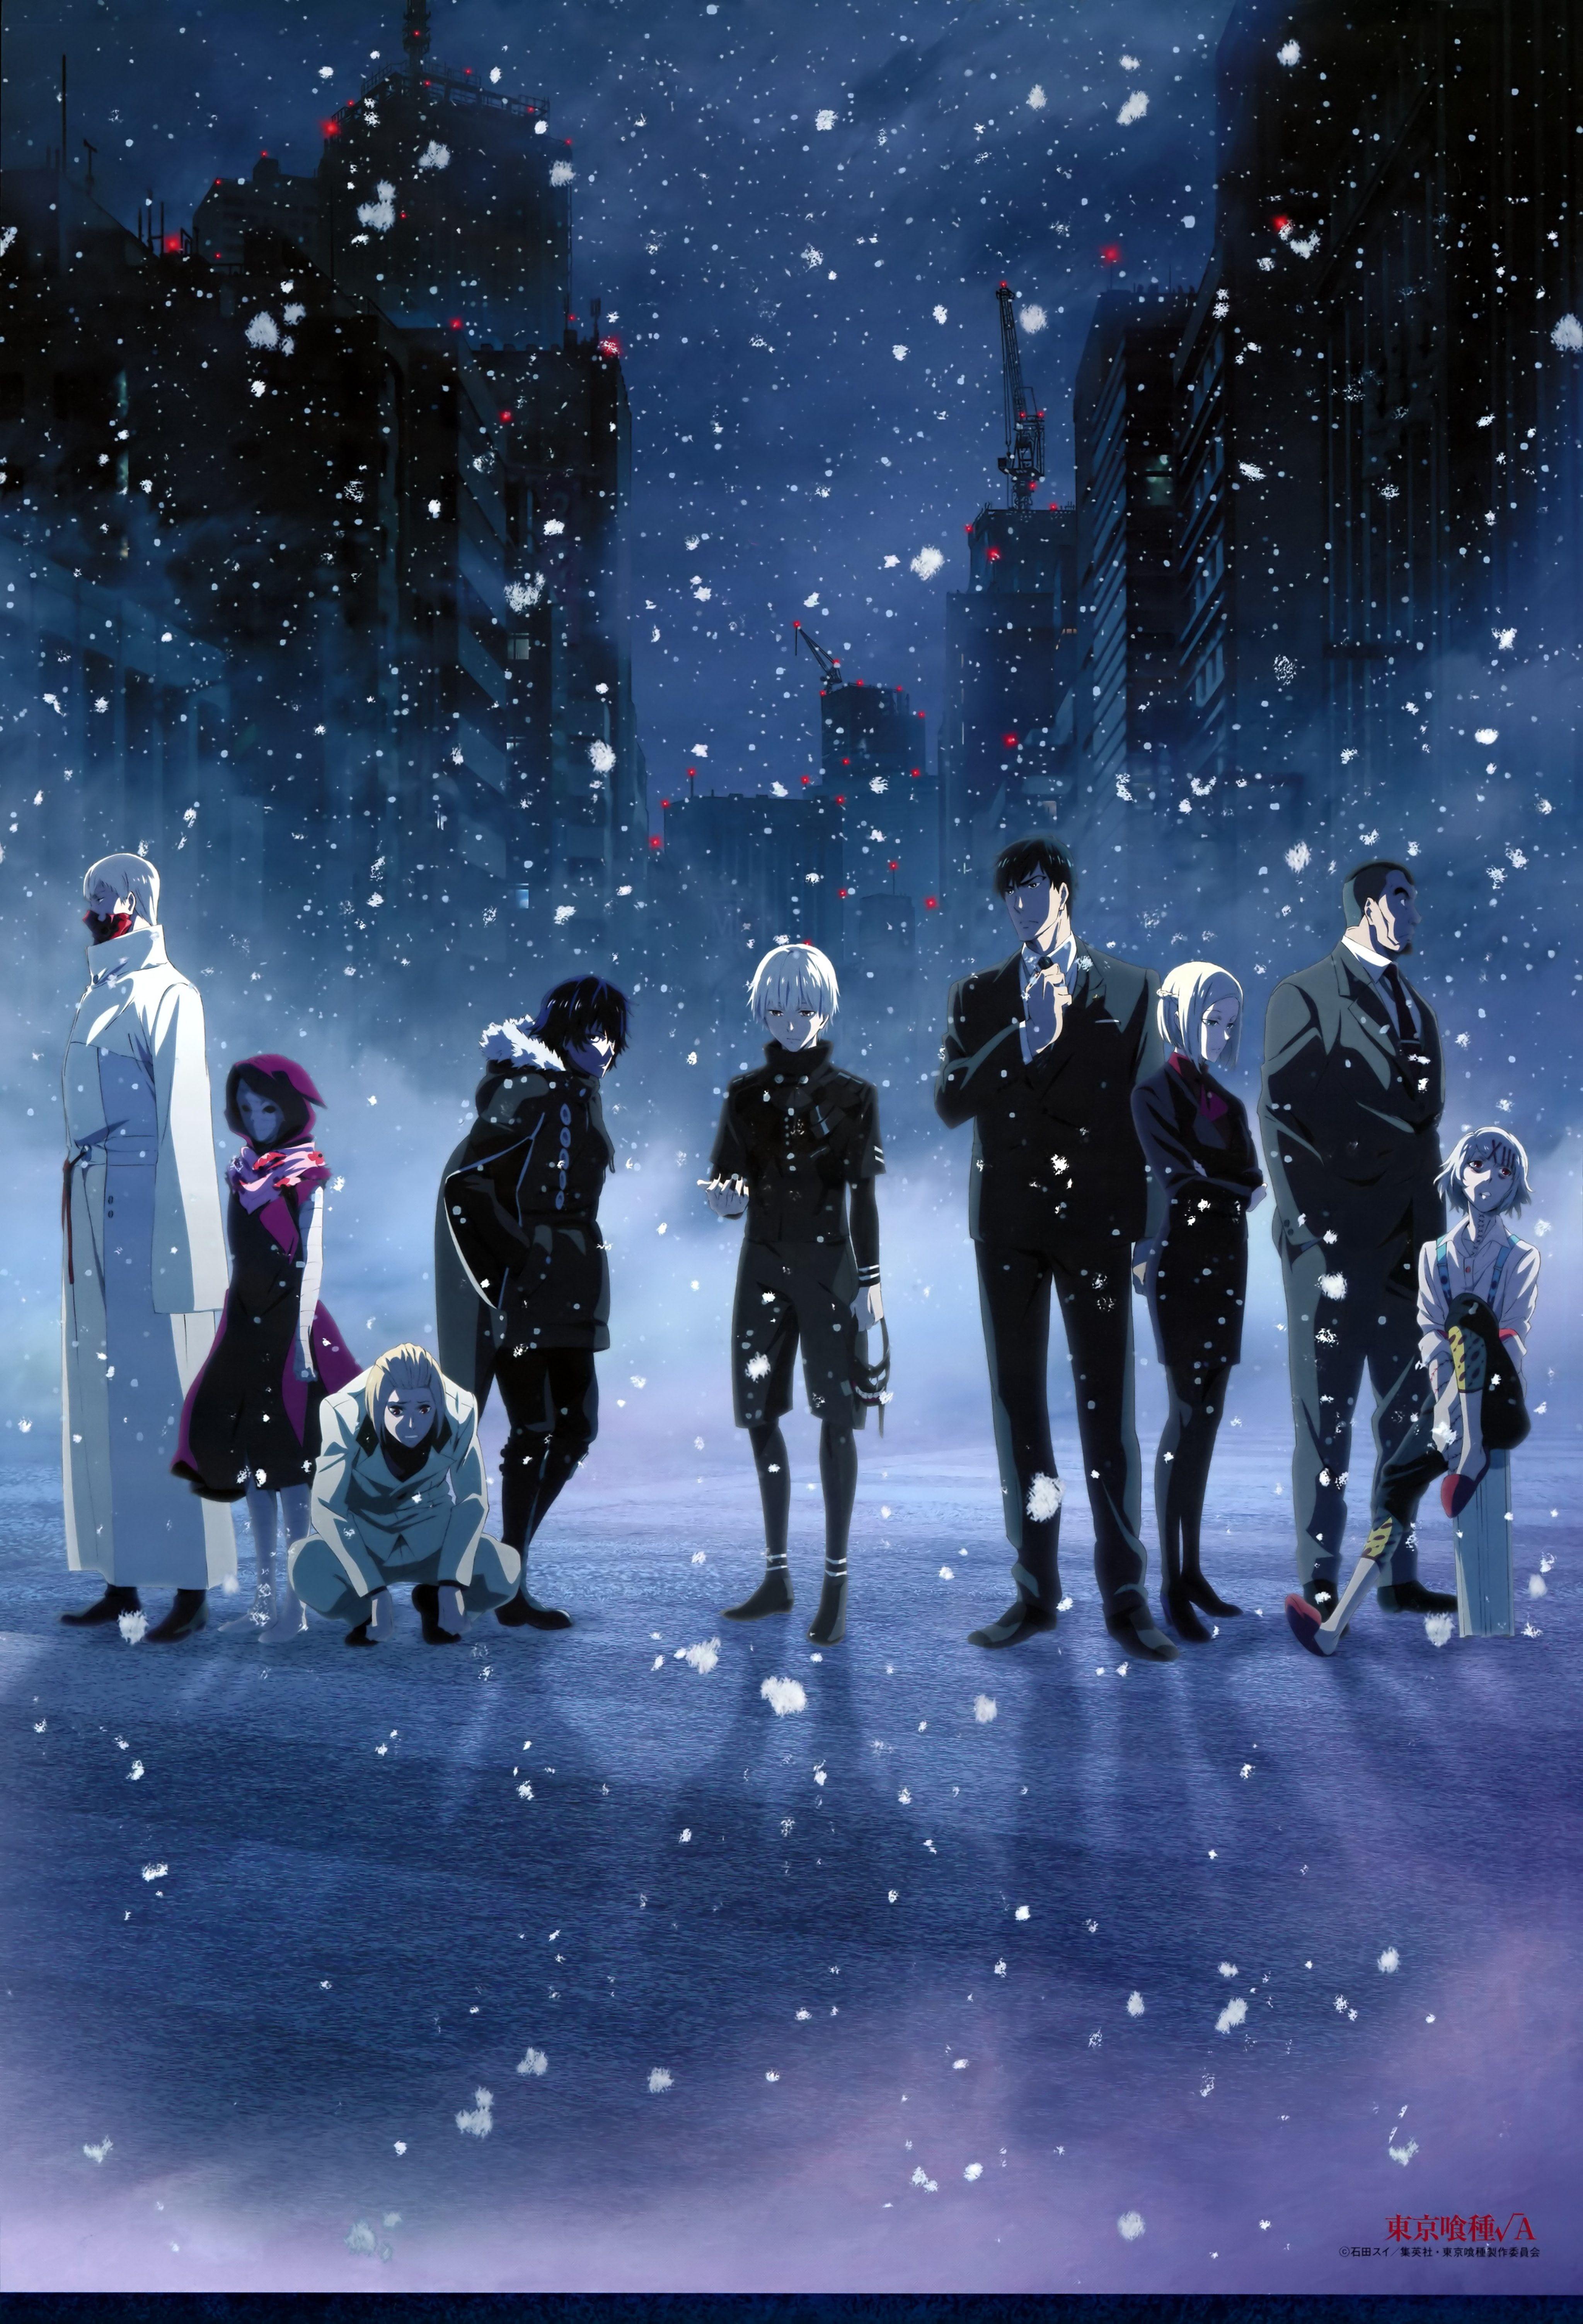 HD wallpaper: Tokyo Ghoul, Koutarou Amon, Tatara, Mado Akira, Eto, Kaneki Ken